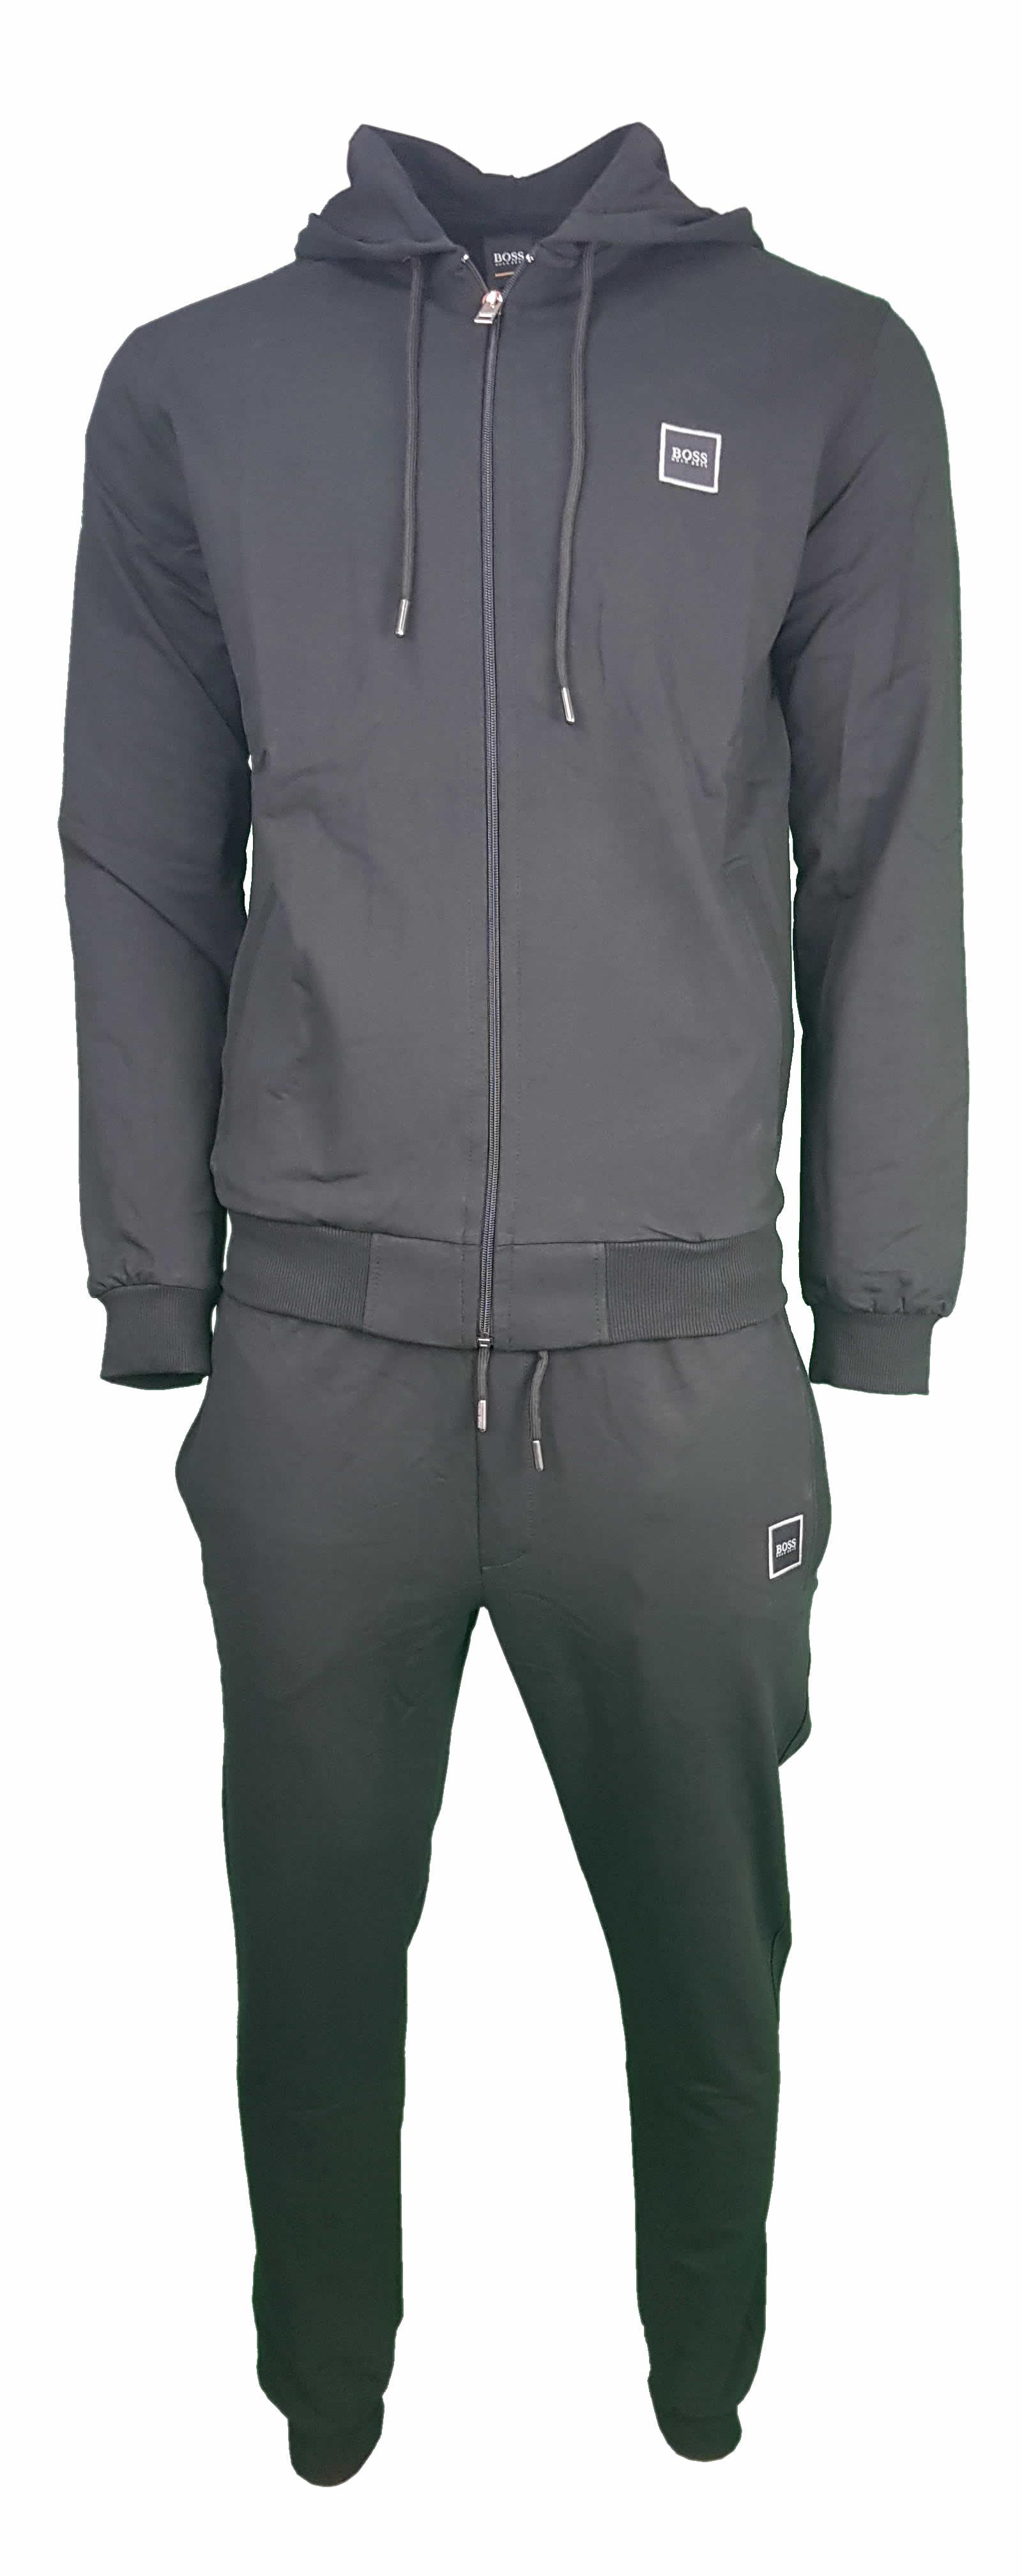 aaa9f2b2e Hugo Boss Pavlik Tracksuit Top Jacket & Bottoms with Contrast Logo in Black